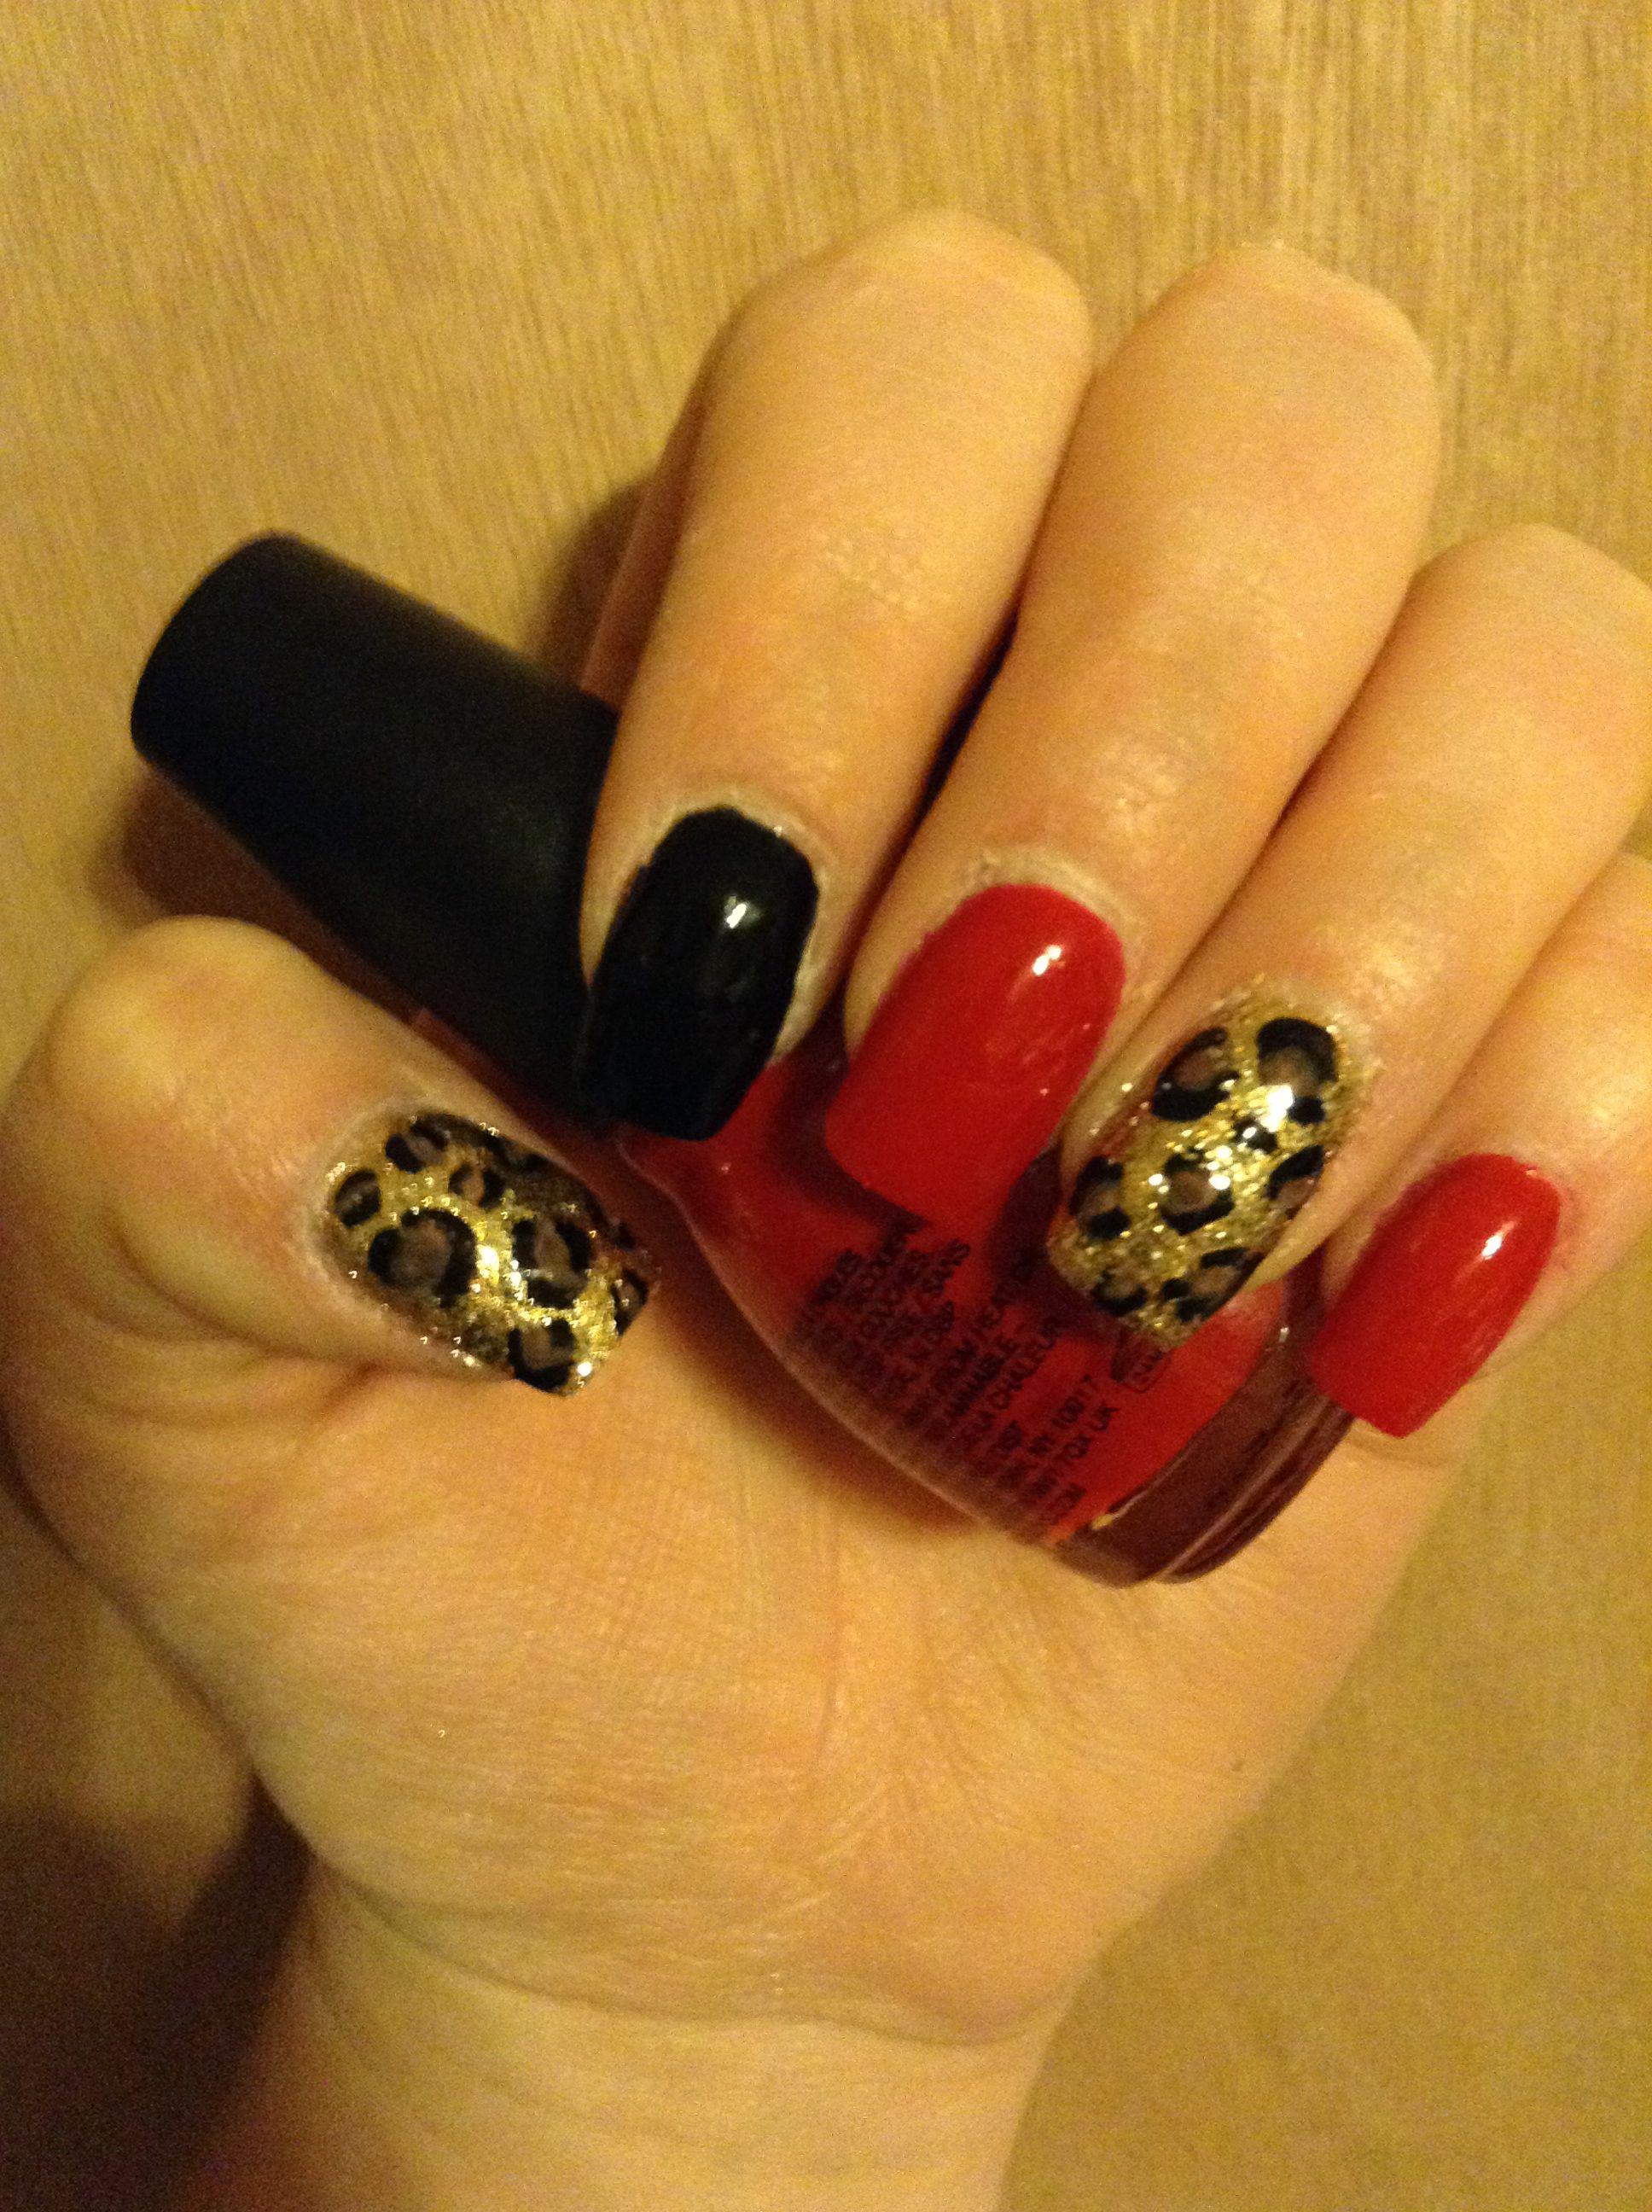 Leopard print nails<3